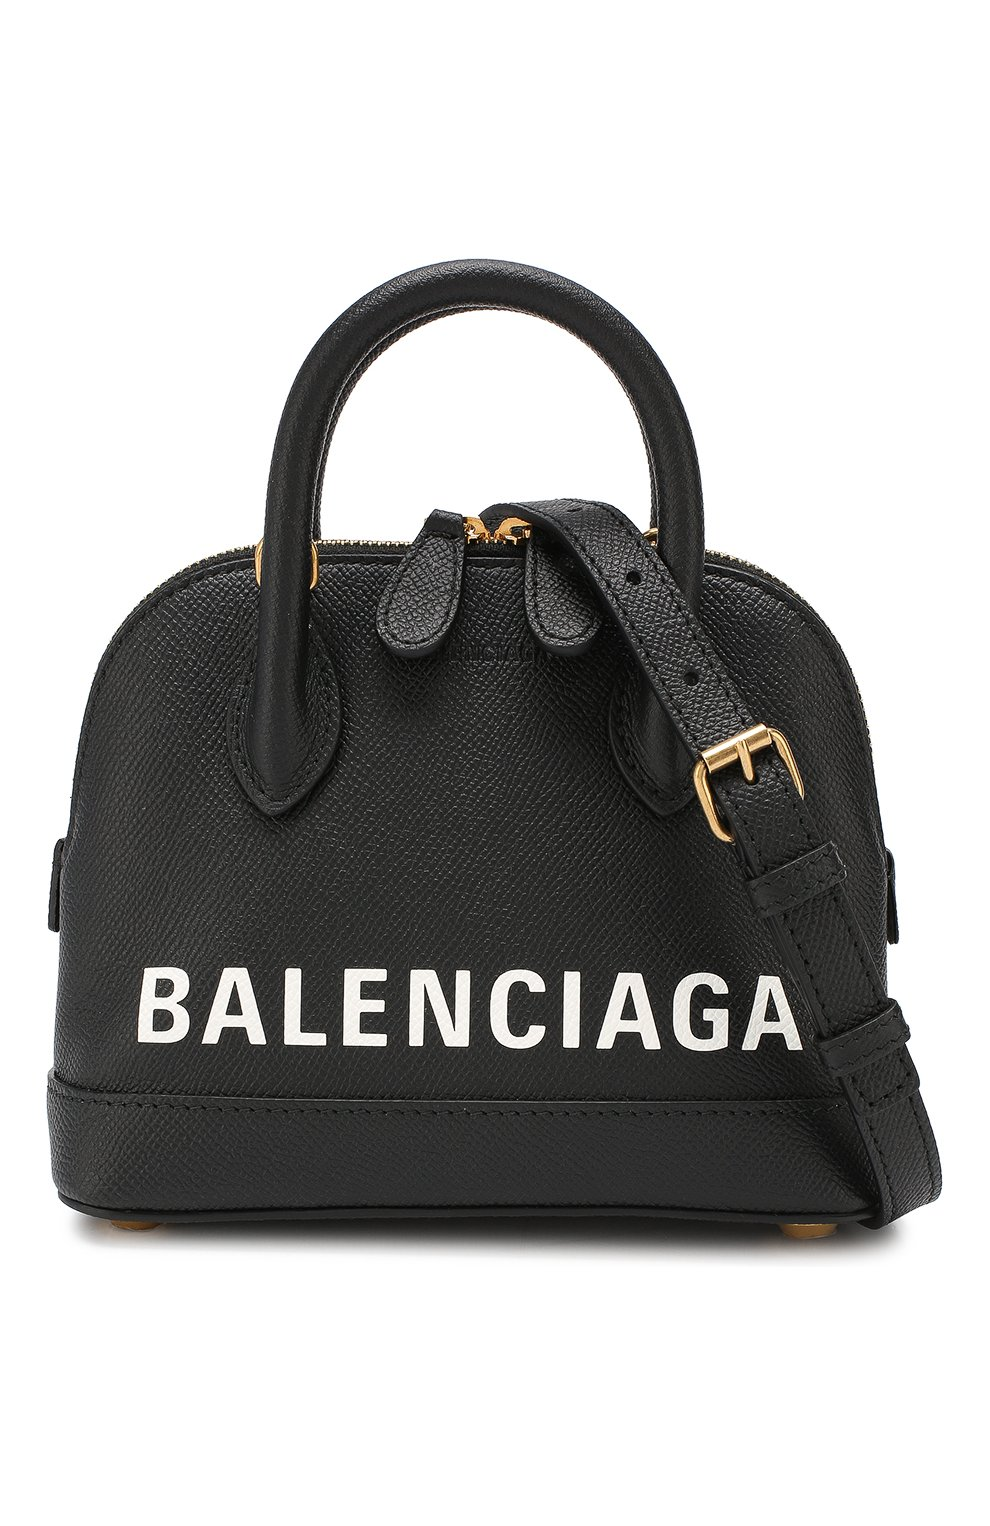 Сумка Ville XXS Balenciaga черная цвета | Фото №6